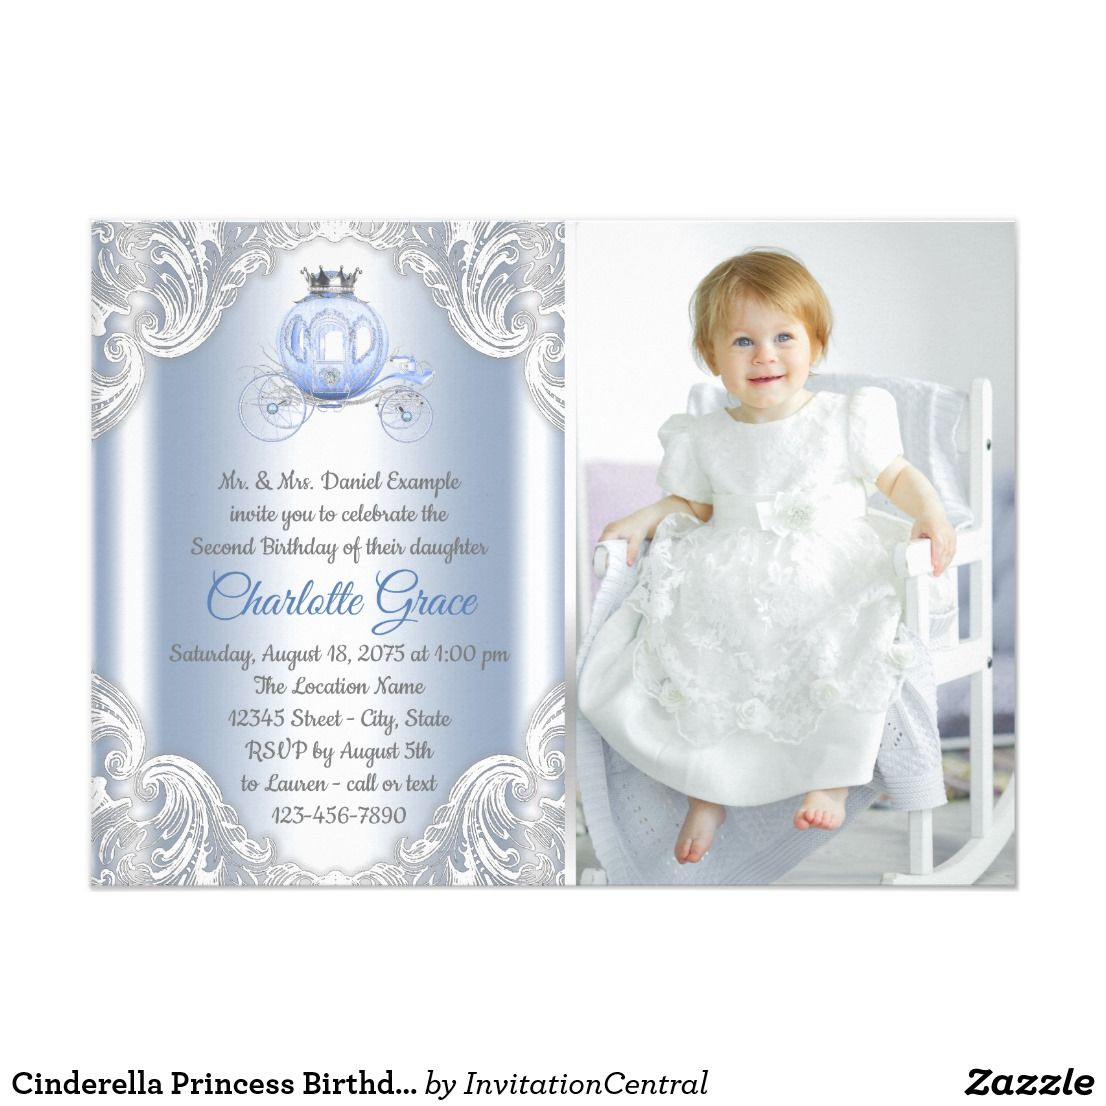 Cinderella Princess Birthday Party Invitation | Invitations ...